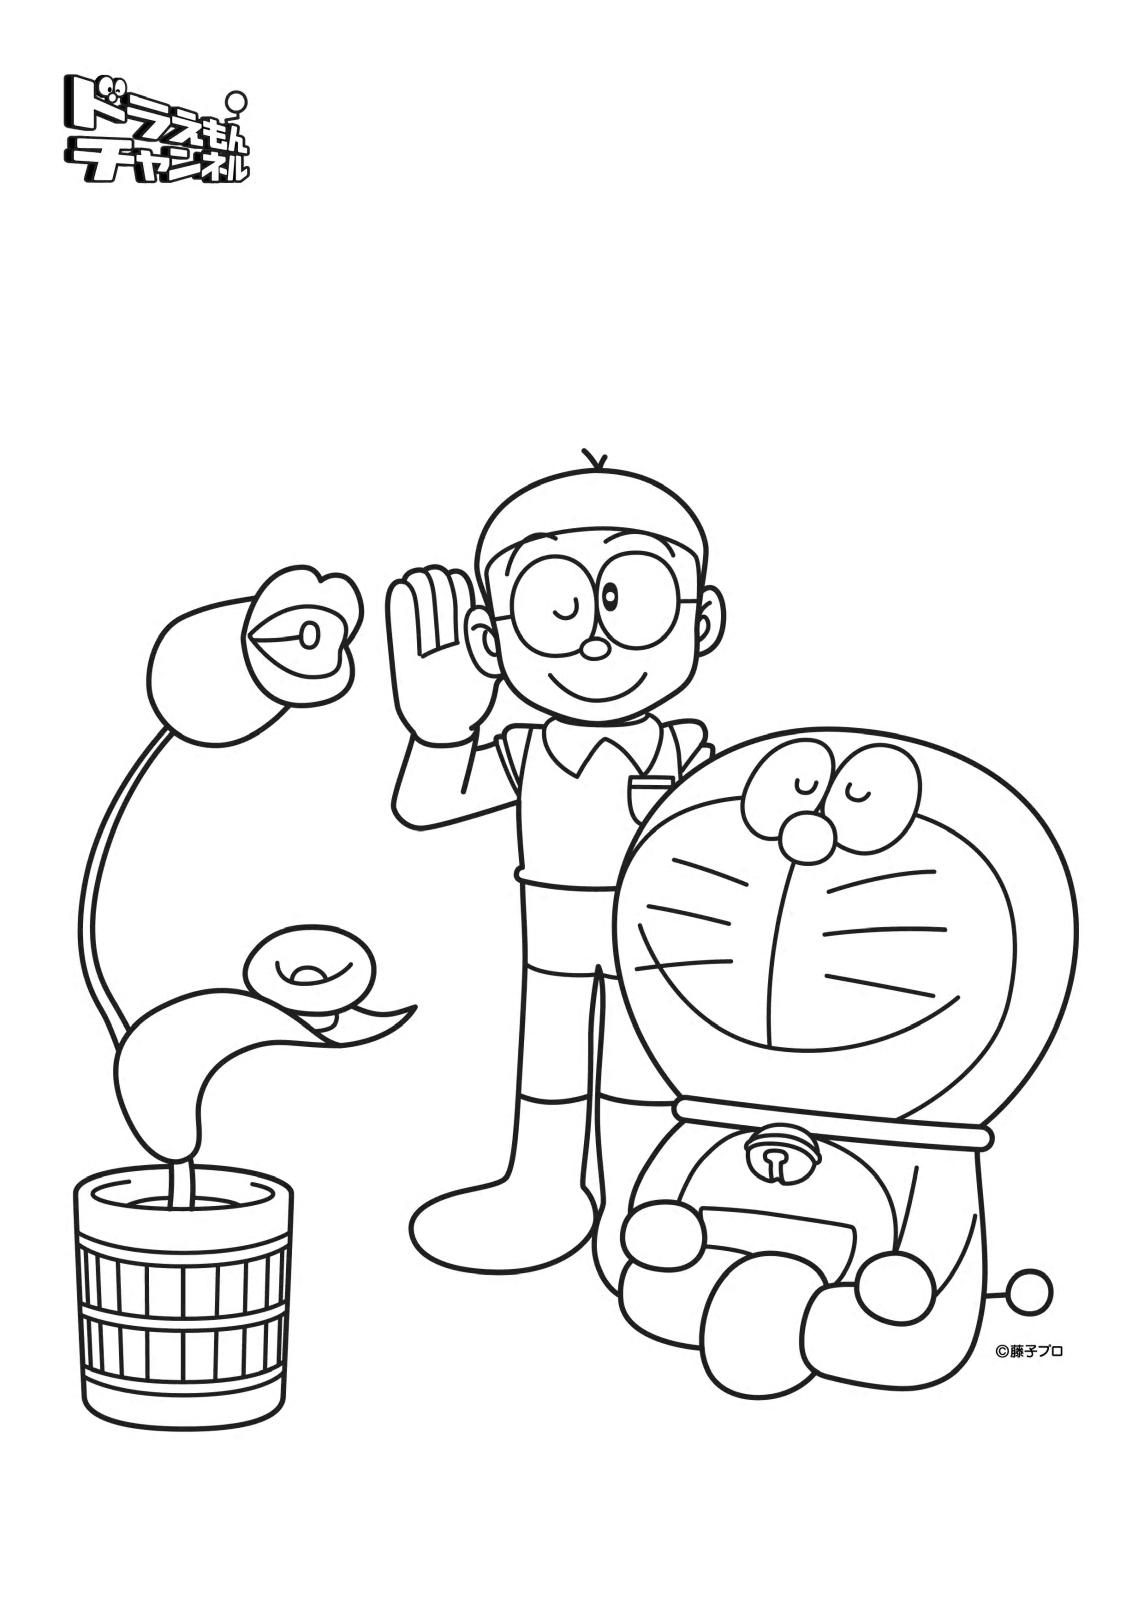 black and white jam clip art hello kitty nerd glasses coloring pages - Coloring Pages Kitty Nerd